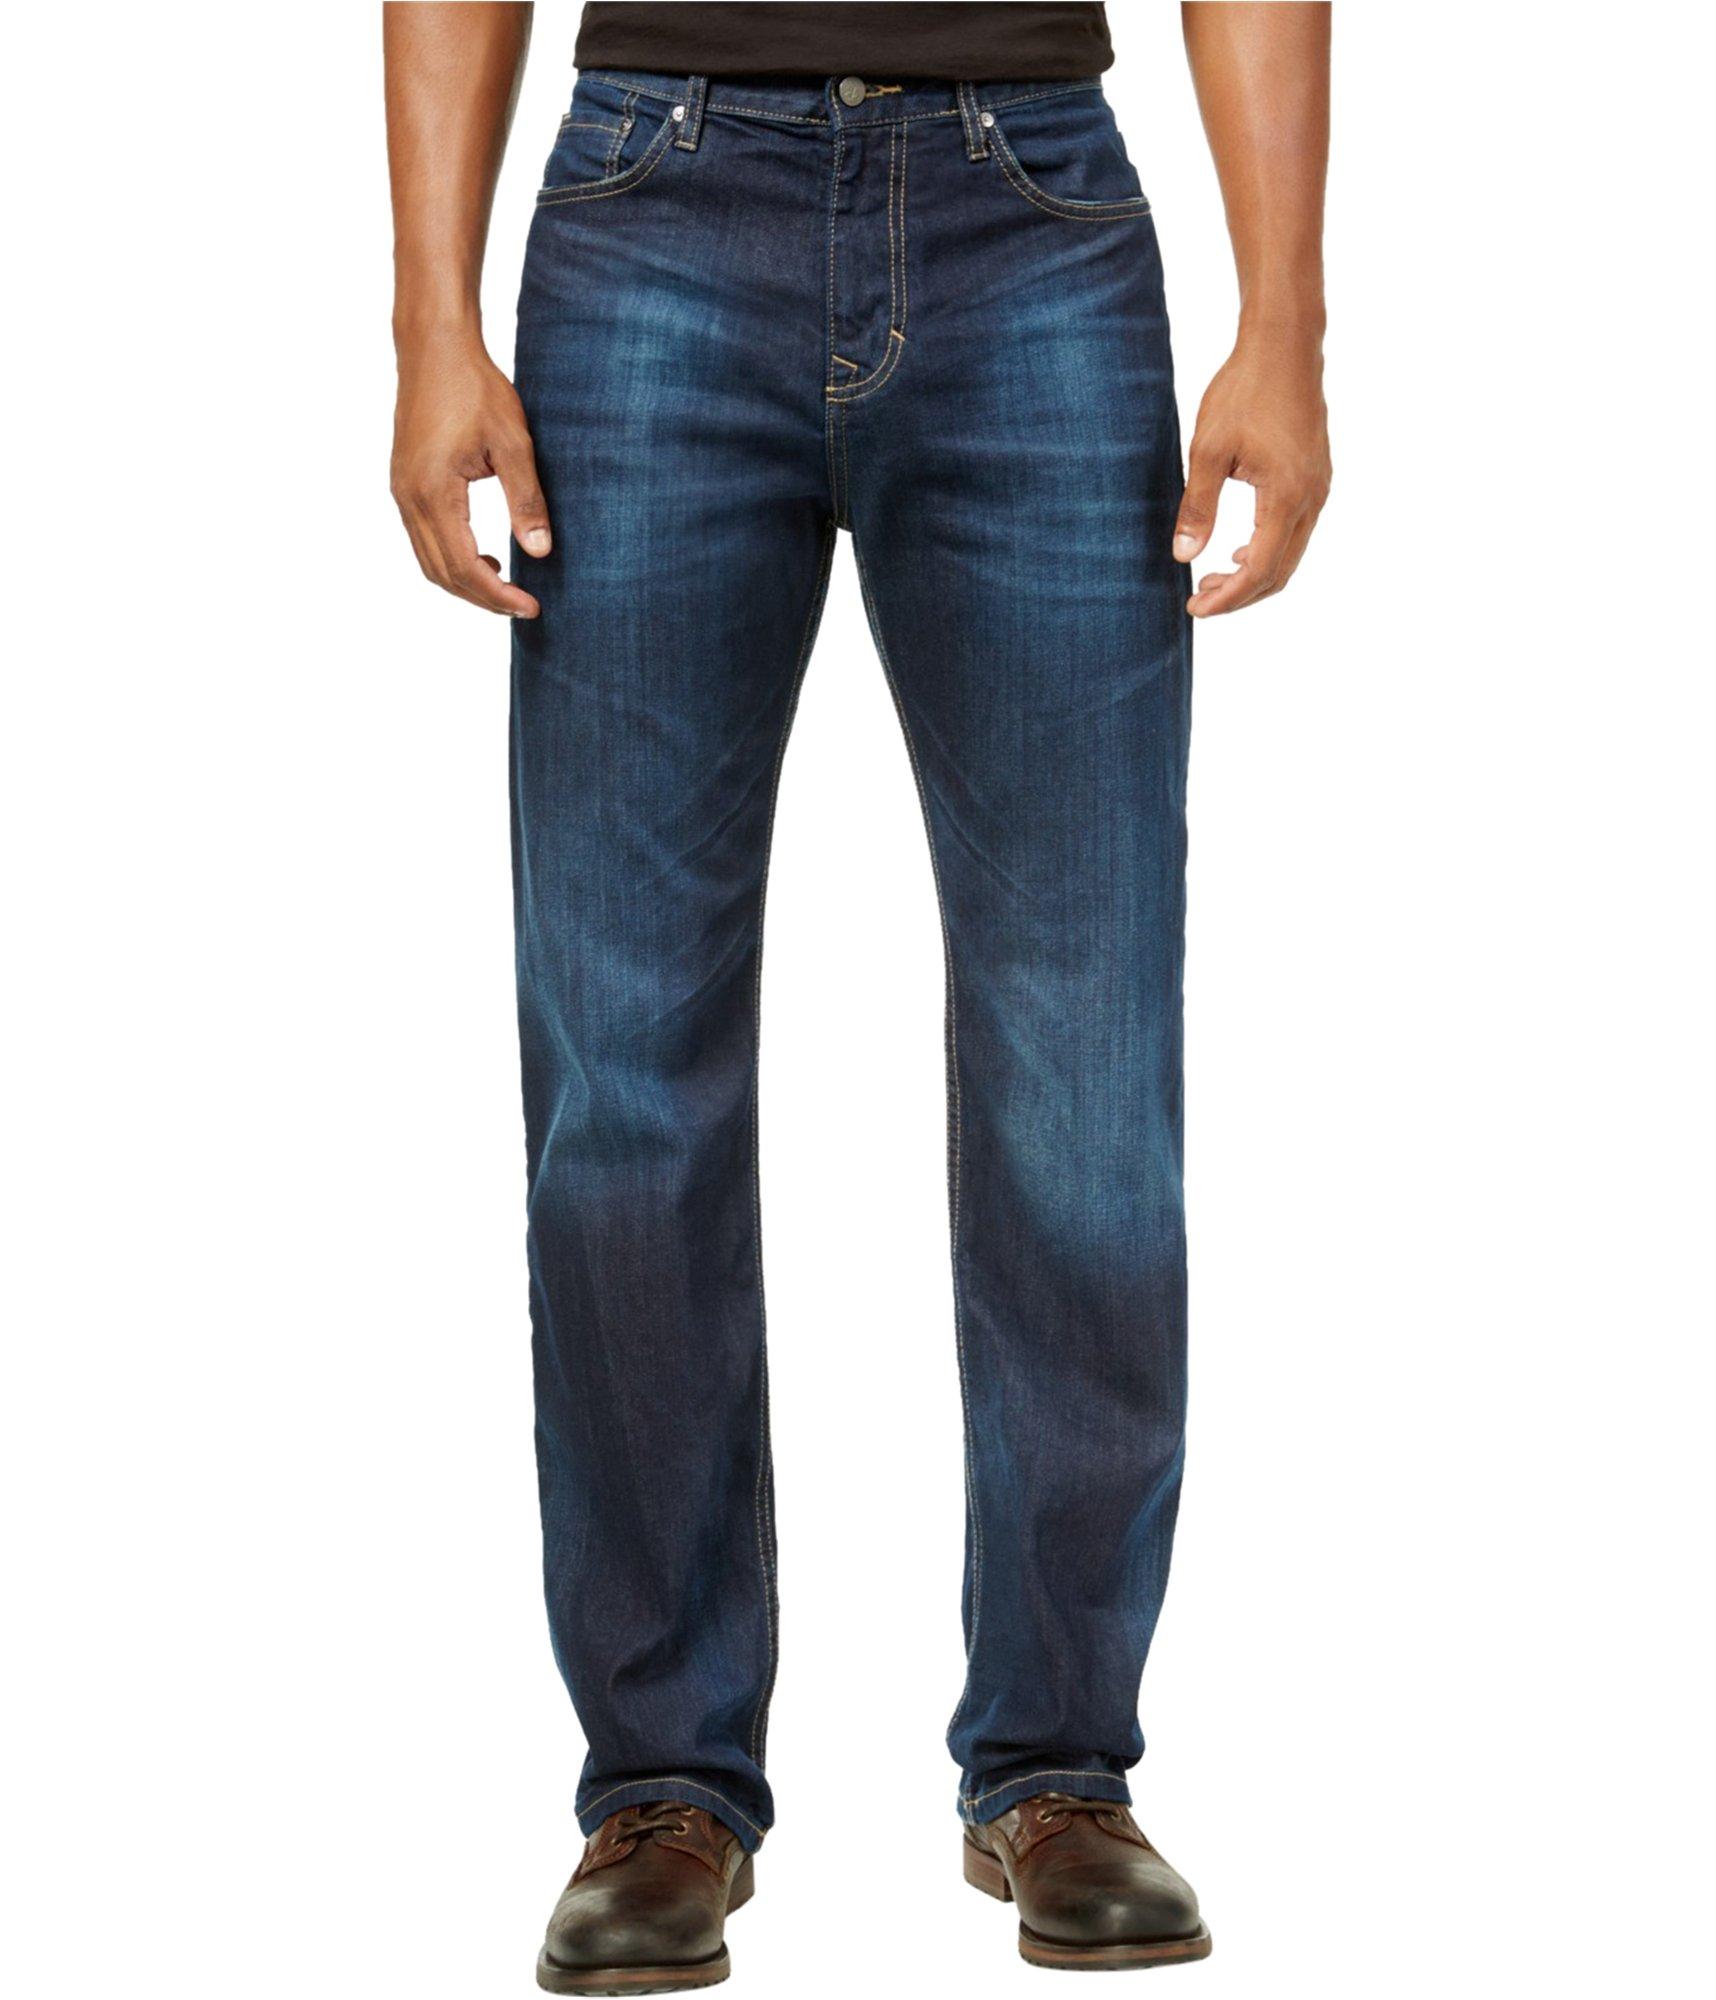 Calvin Klein Jeans Men's Relaxed Fit Denim, Deep Water, 30x30 by Calvin Klein Jeans